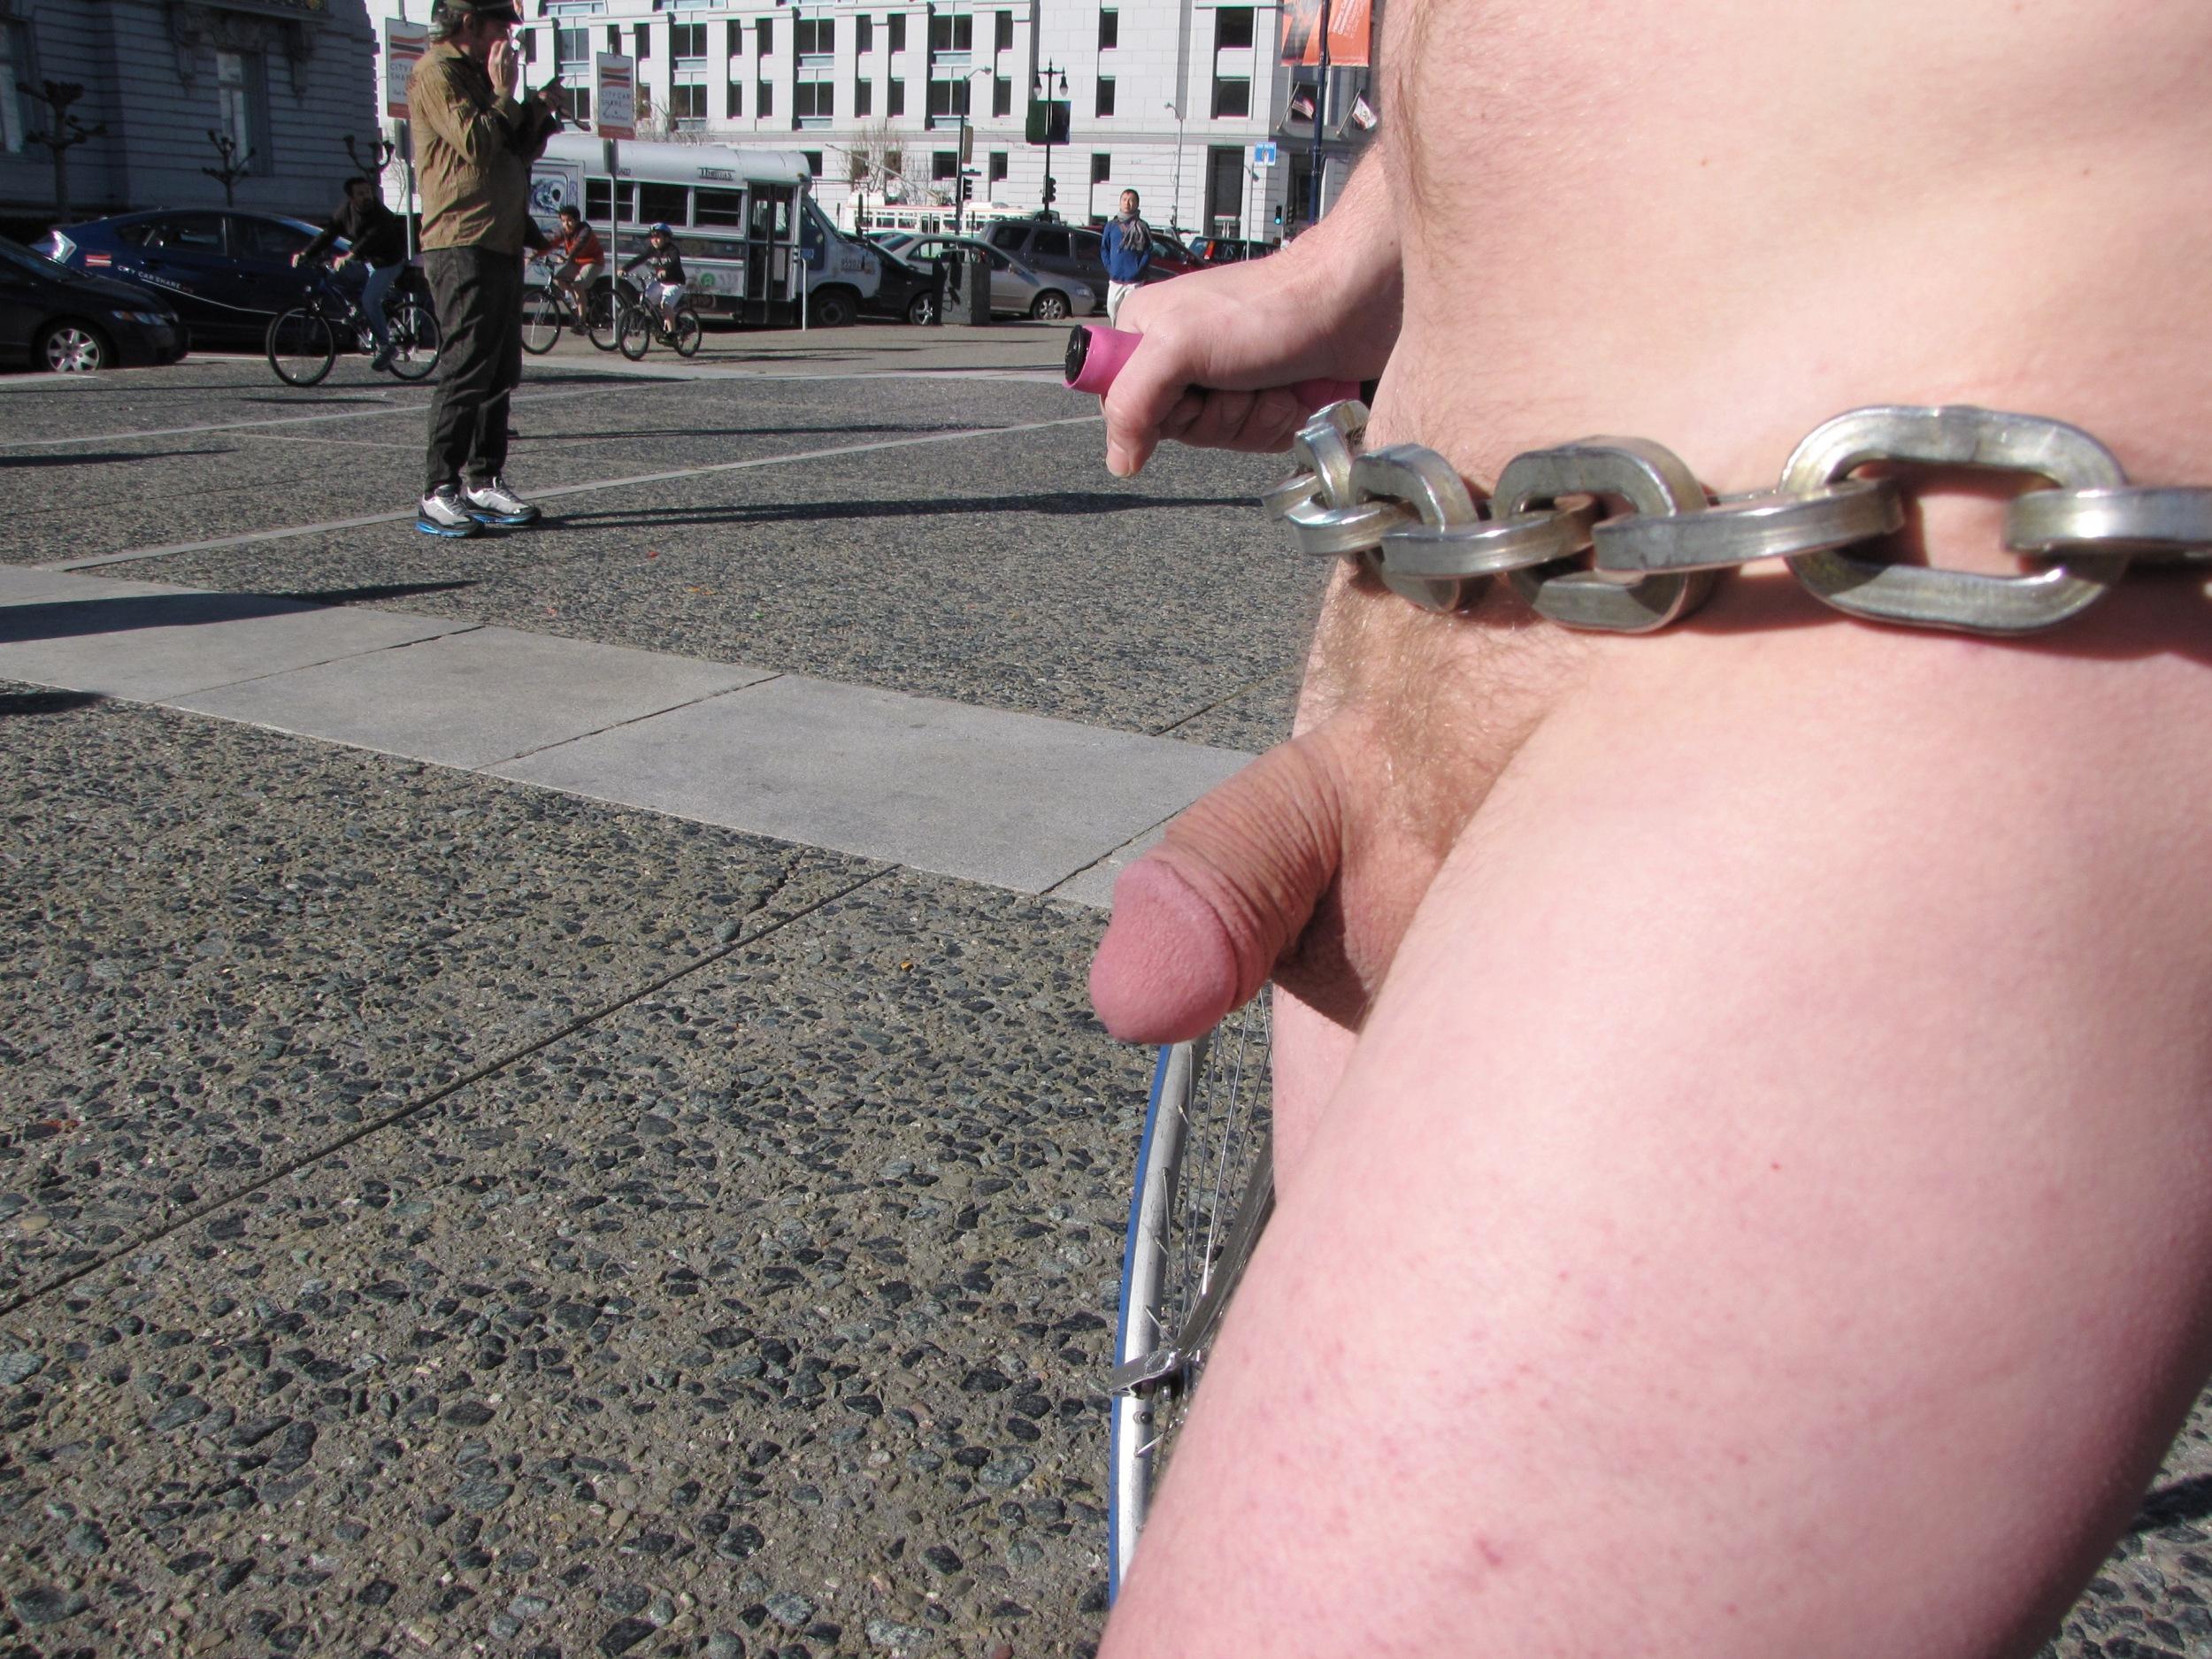 nude protest の 画像 page 2 へ 一覧 bird s eye view nude protest ...: gazo.coresv.com/nude+protest/pic3.html